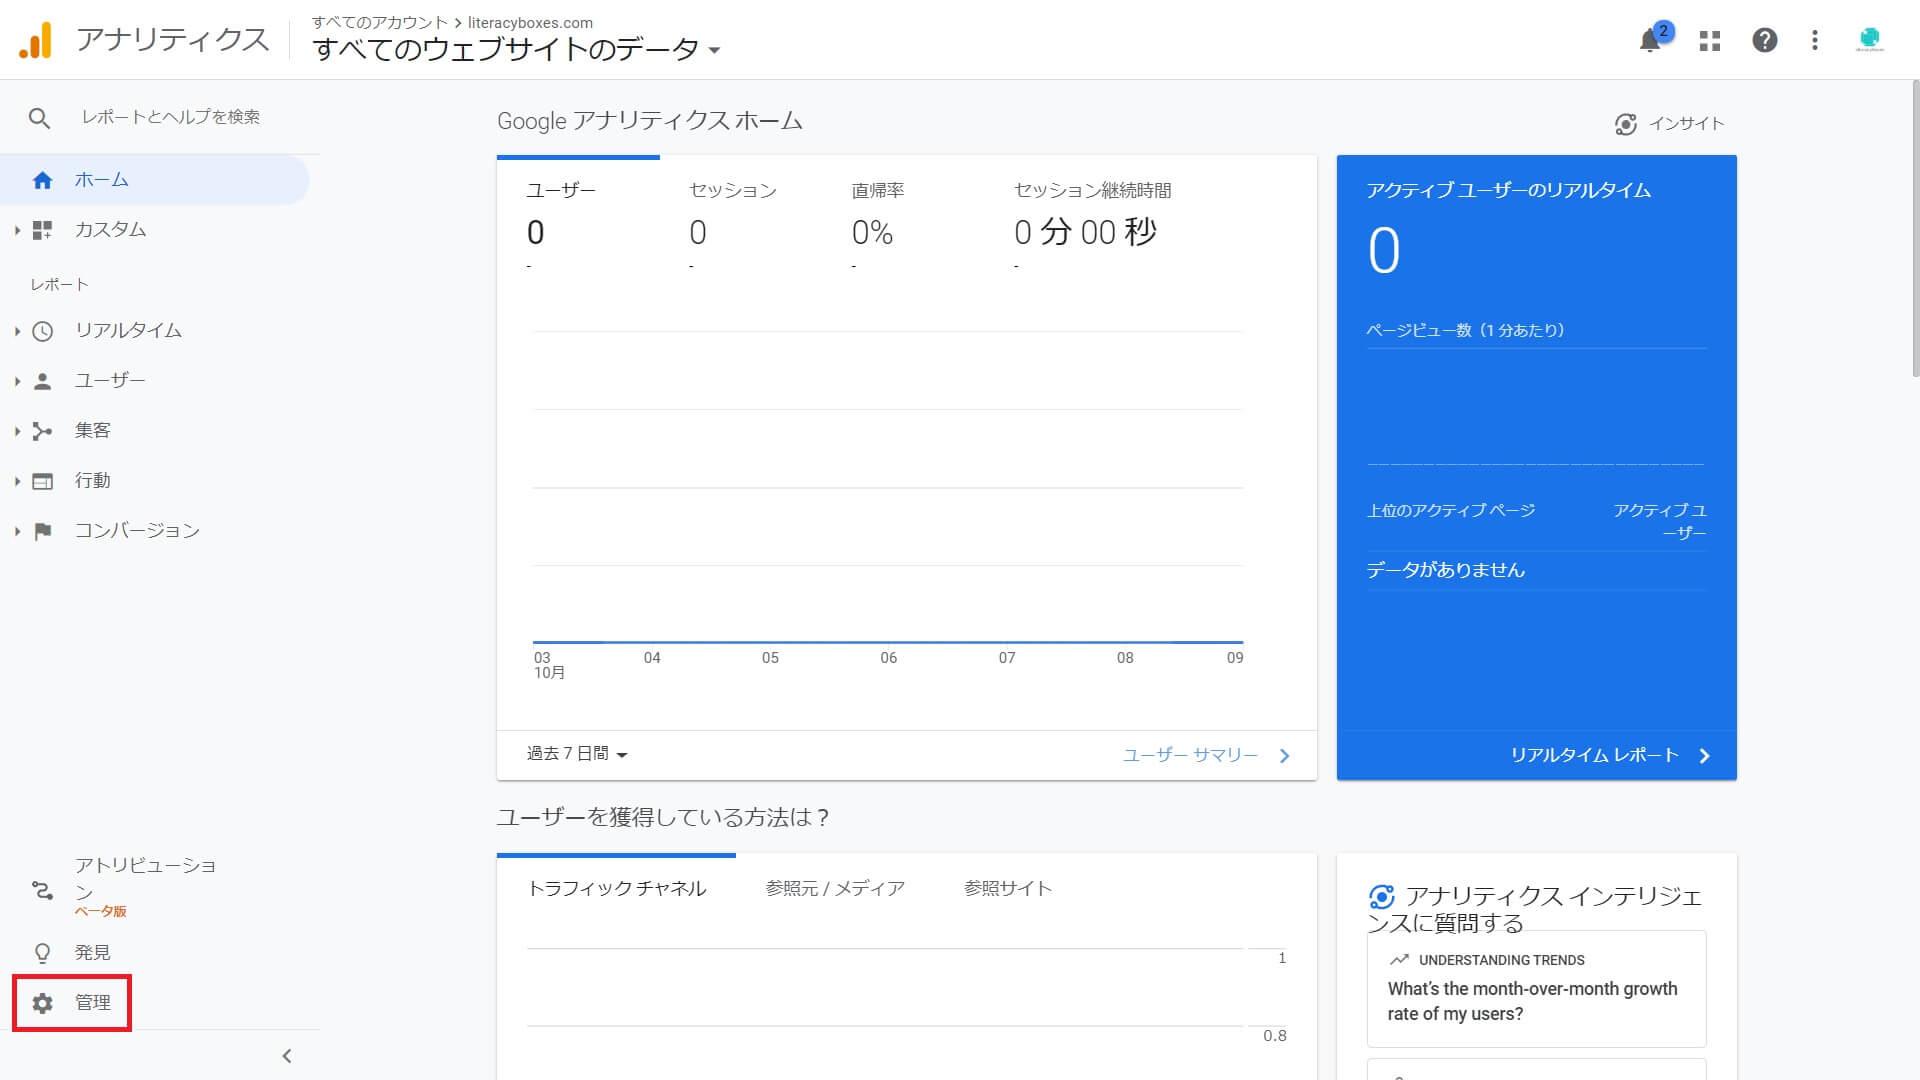 Googleアナリティクス-ユニバーサルアナリティクス-管理に移動